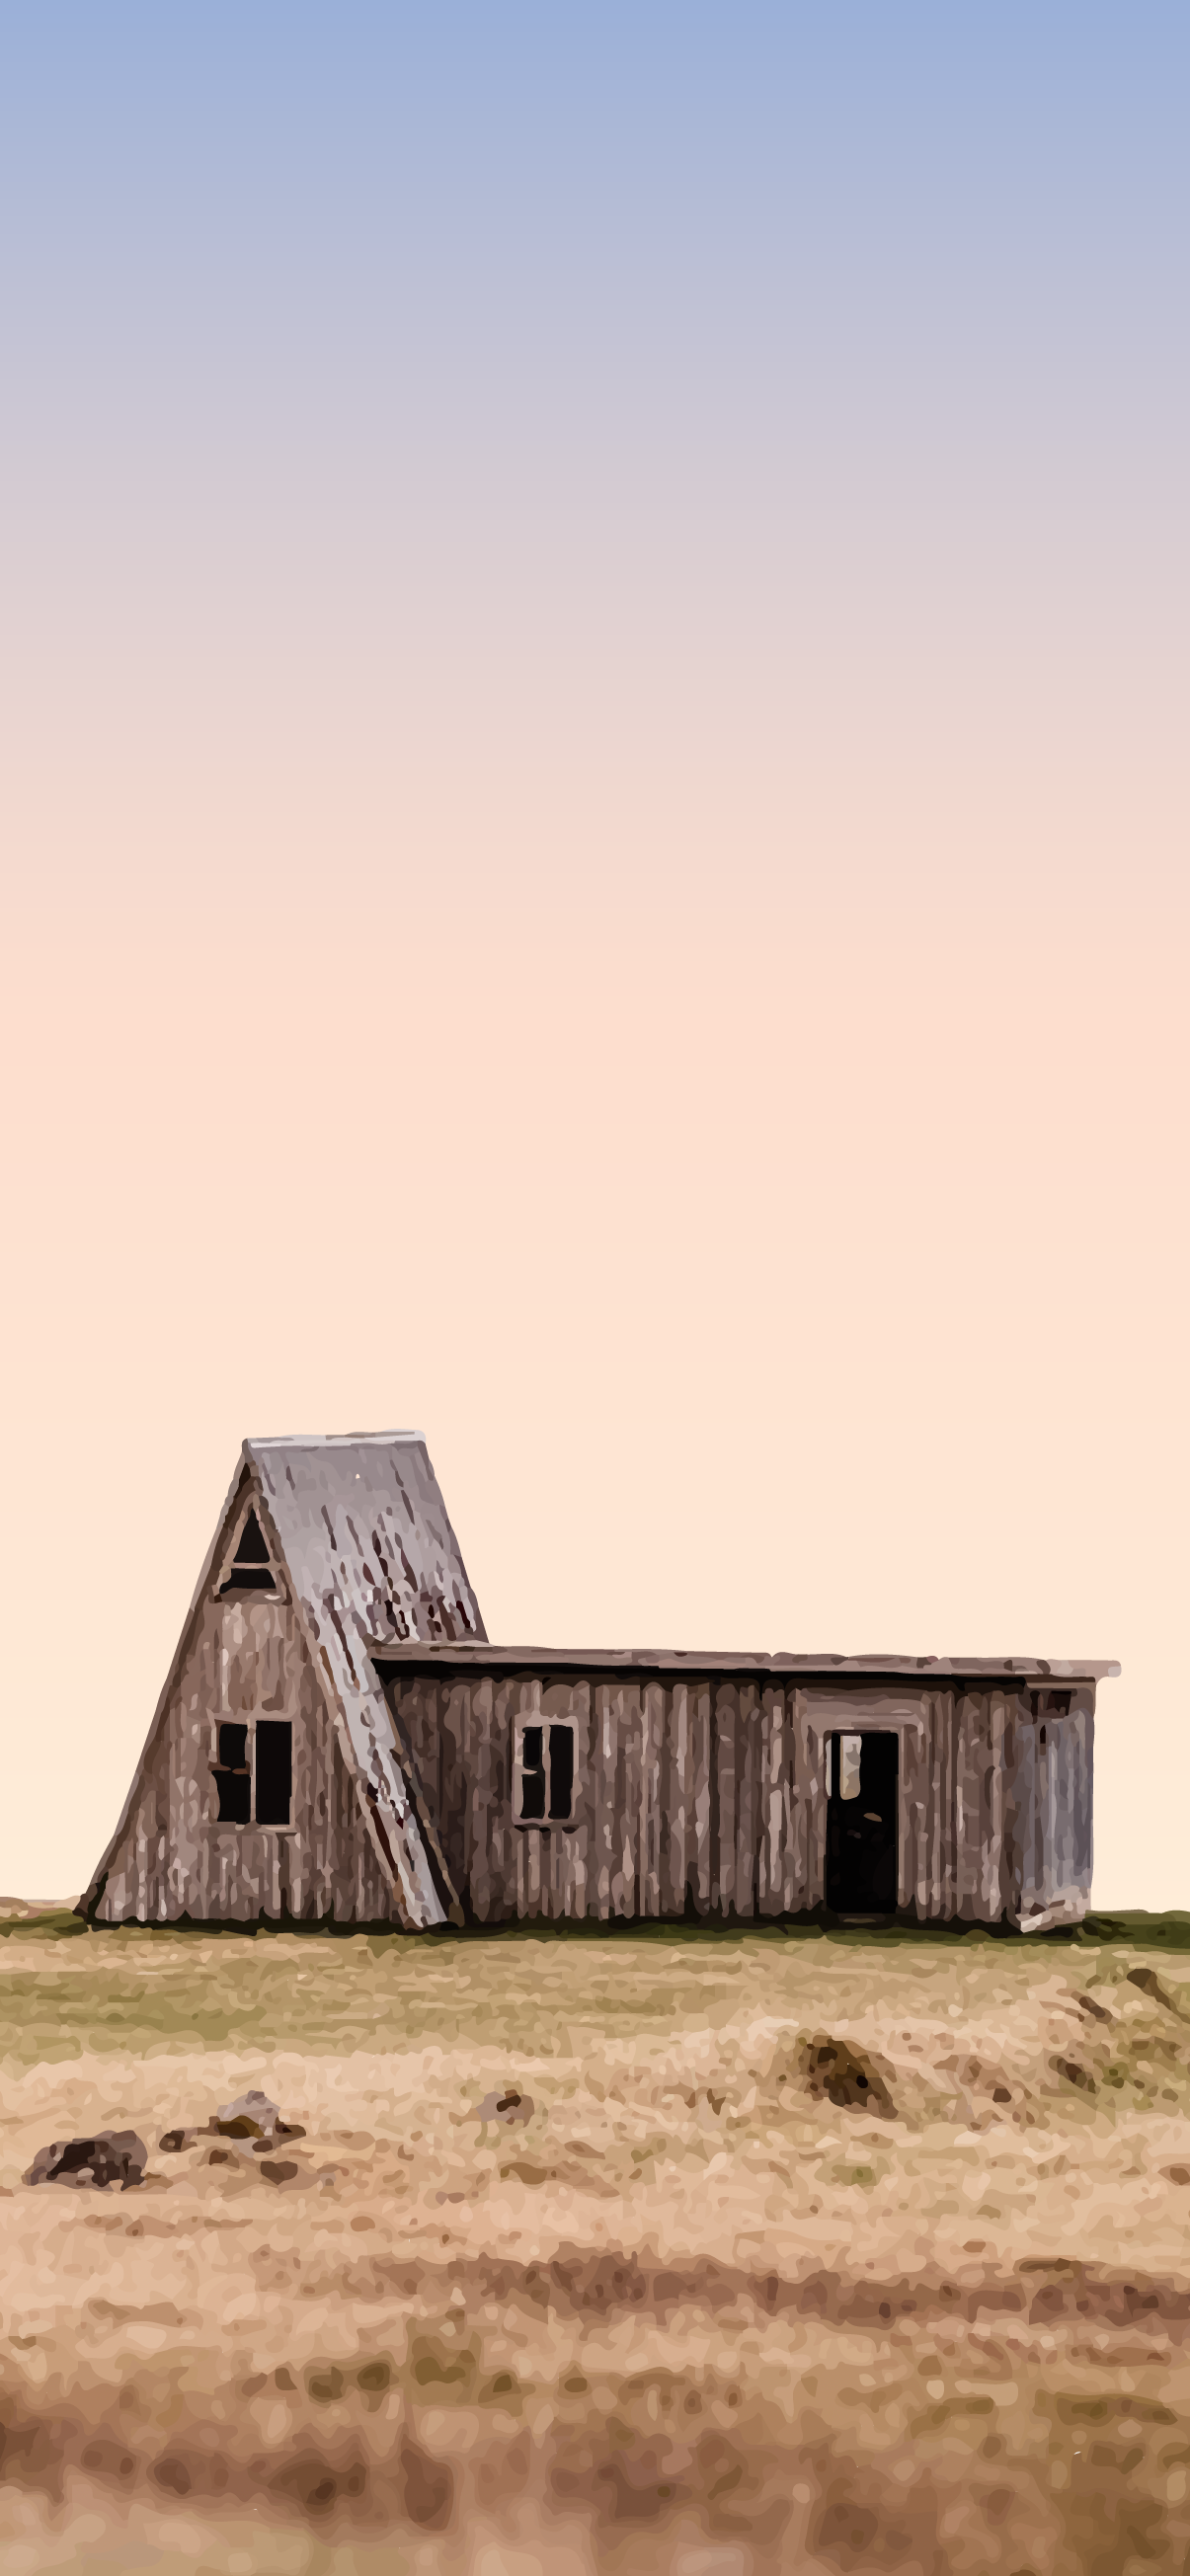 house-landscape-wallpaper-iphone-4k